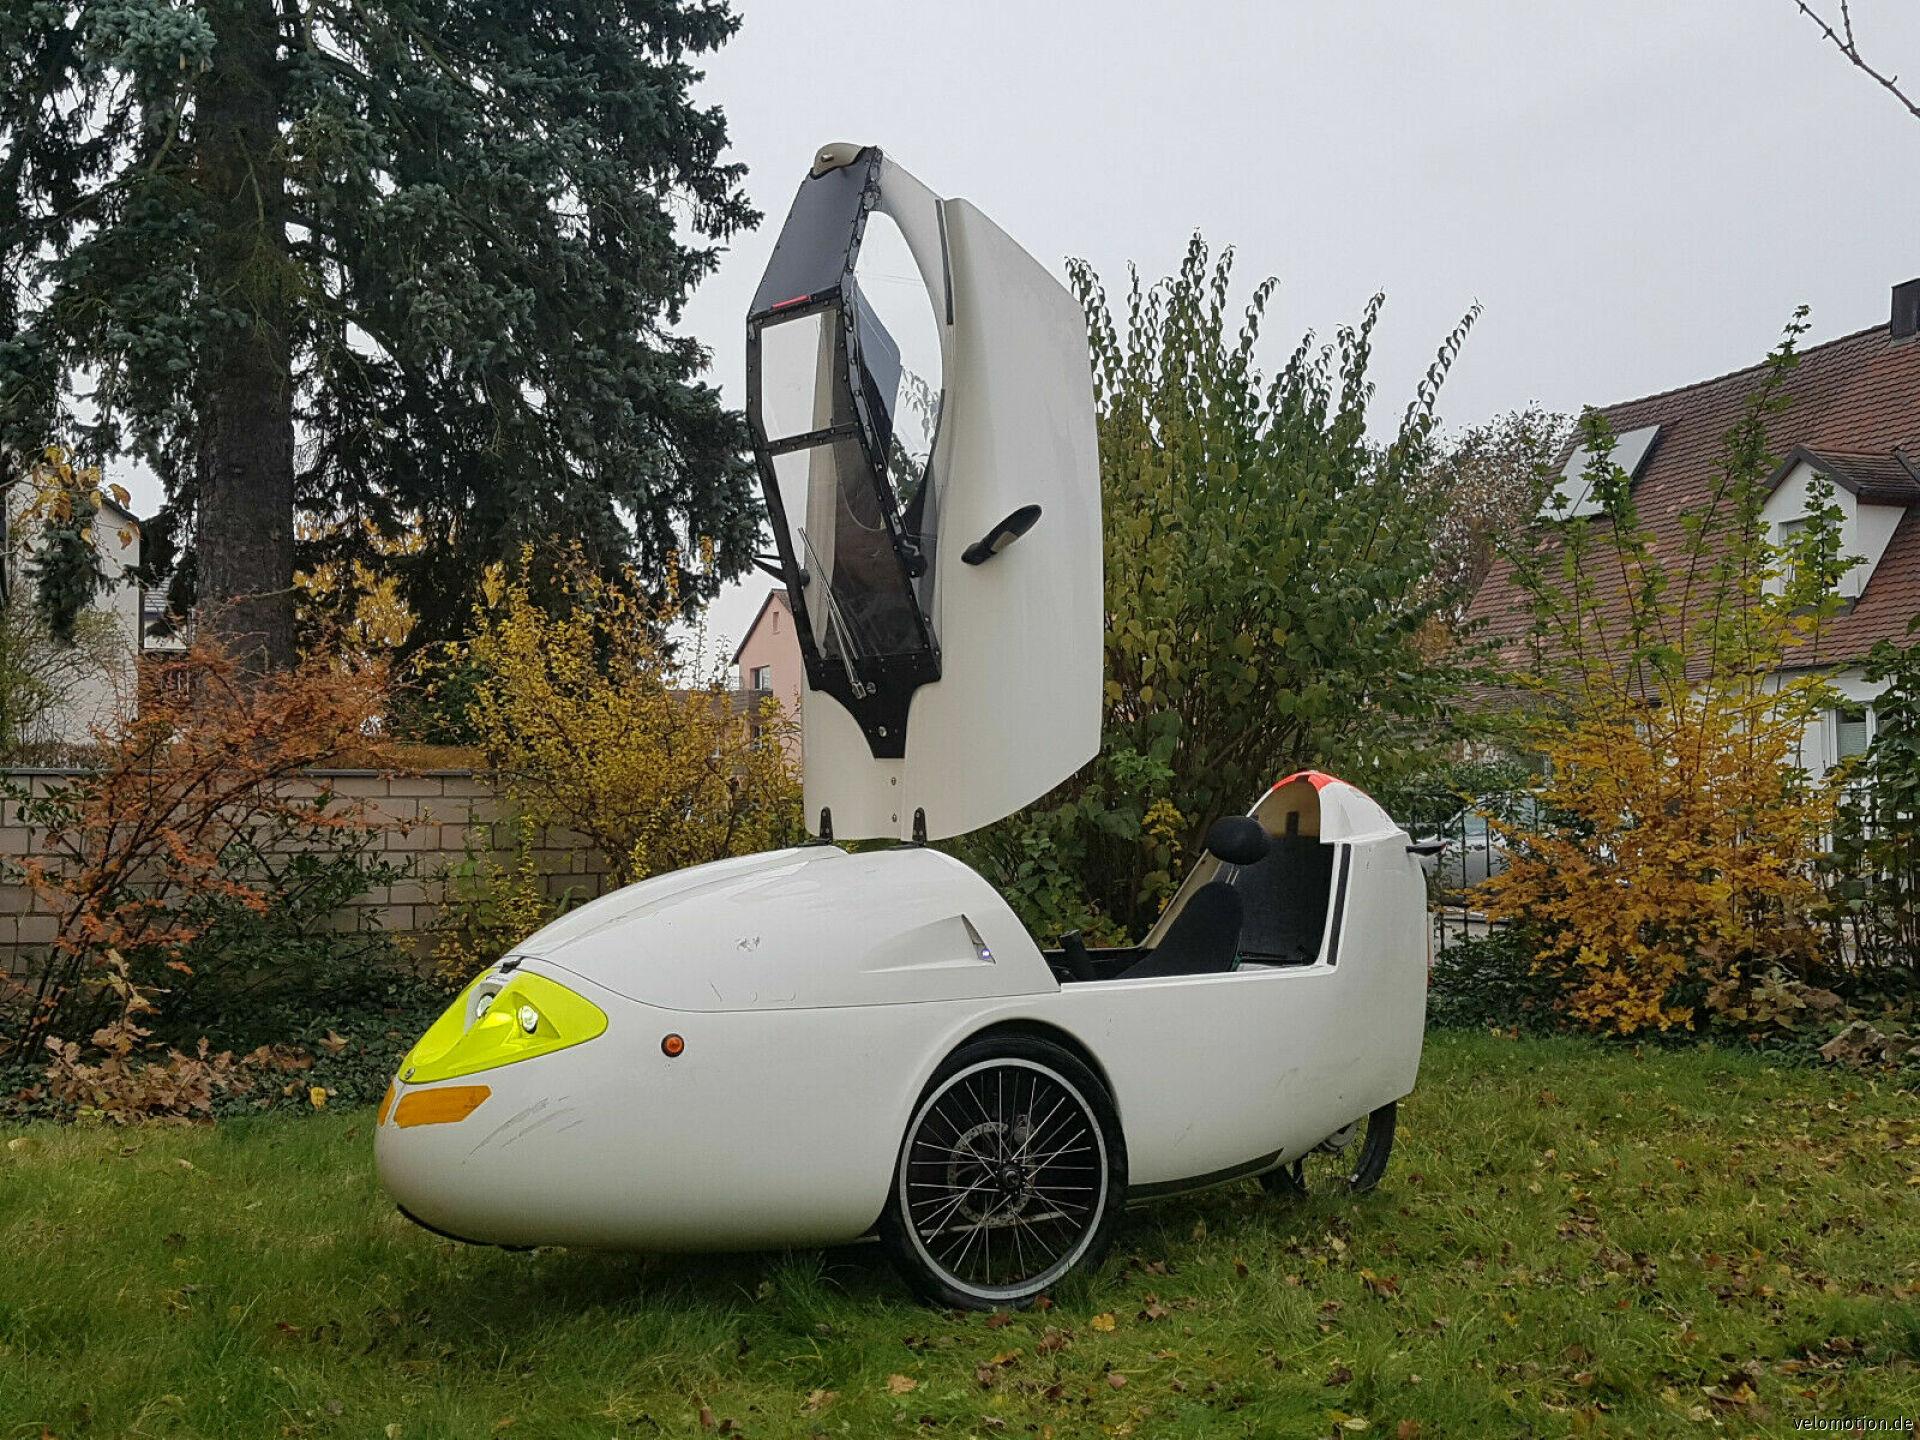 Velomobil Sunrider Hybrid, Beschleunigung 0-40kmh  #1